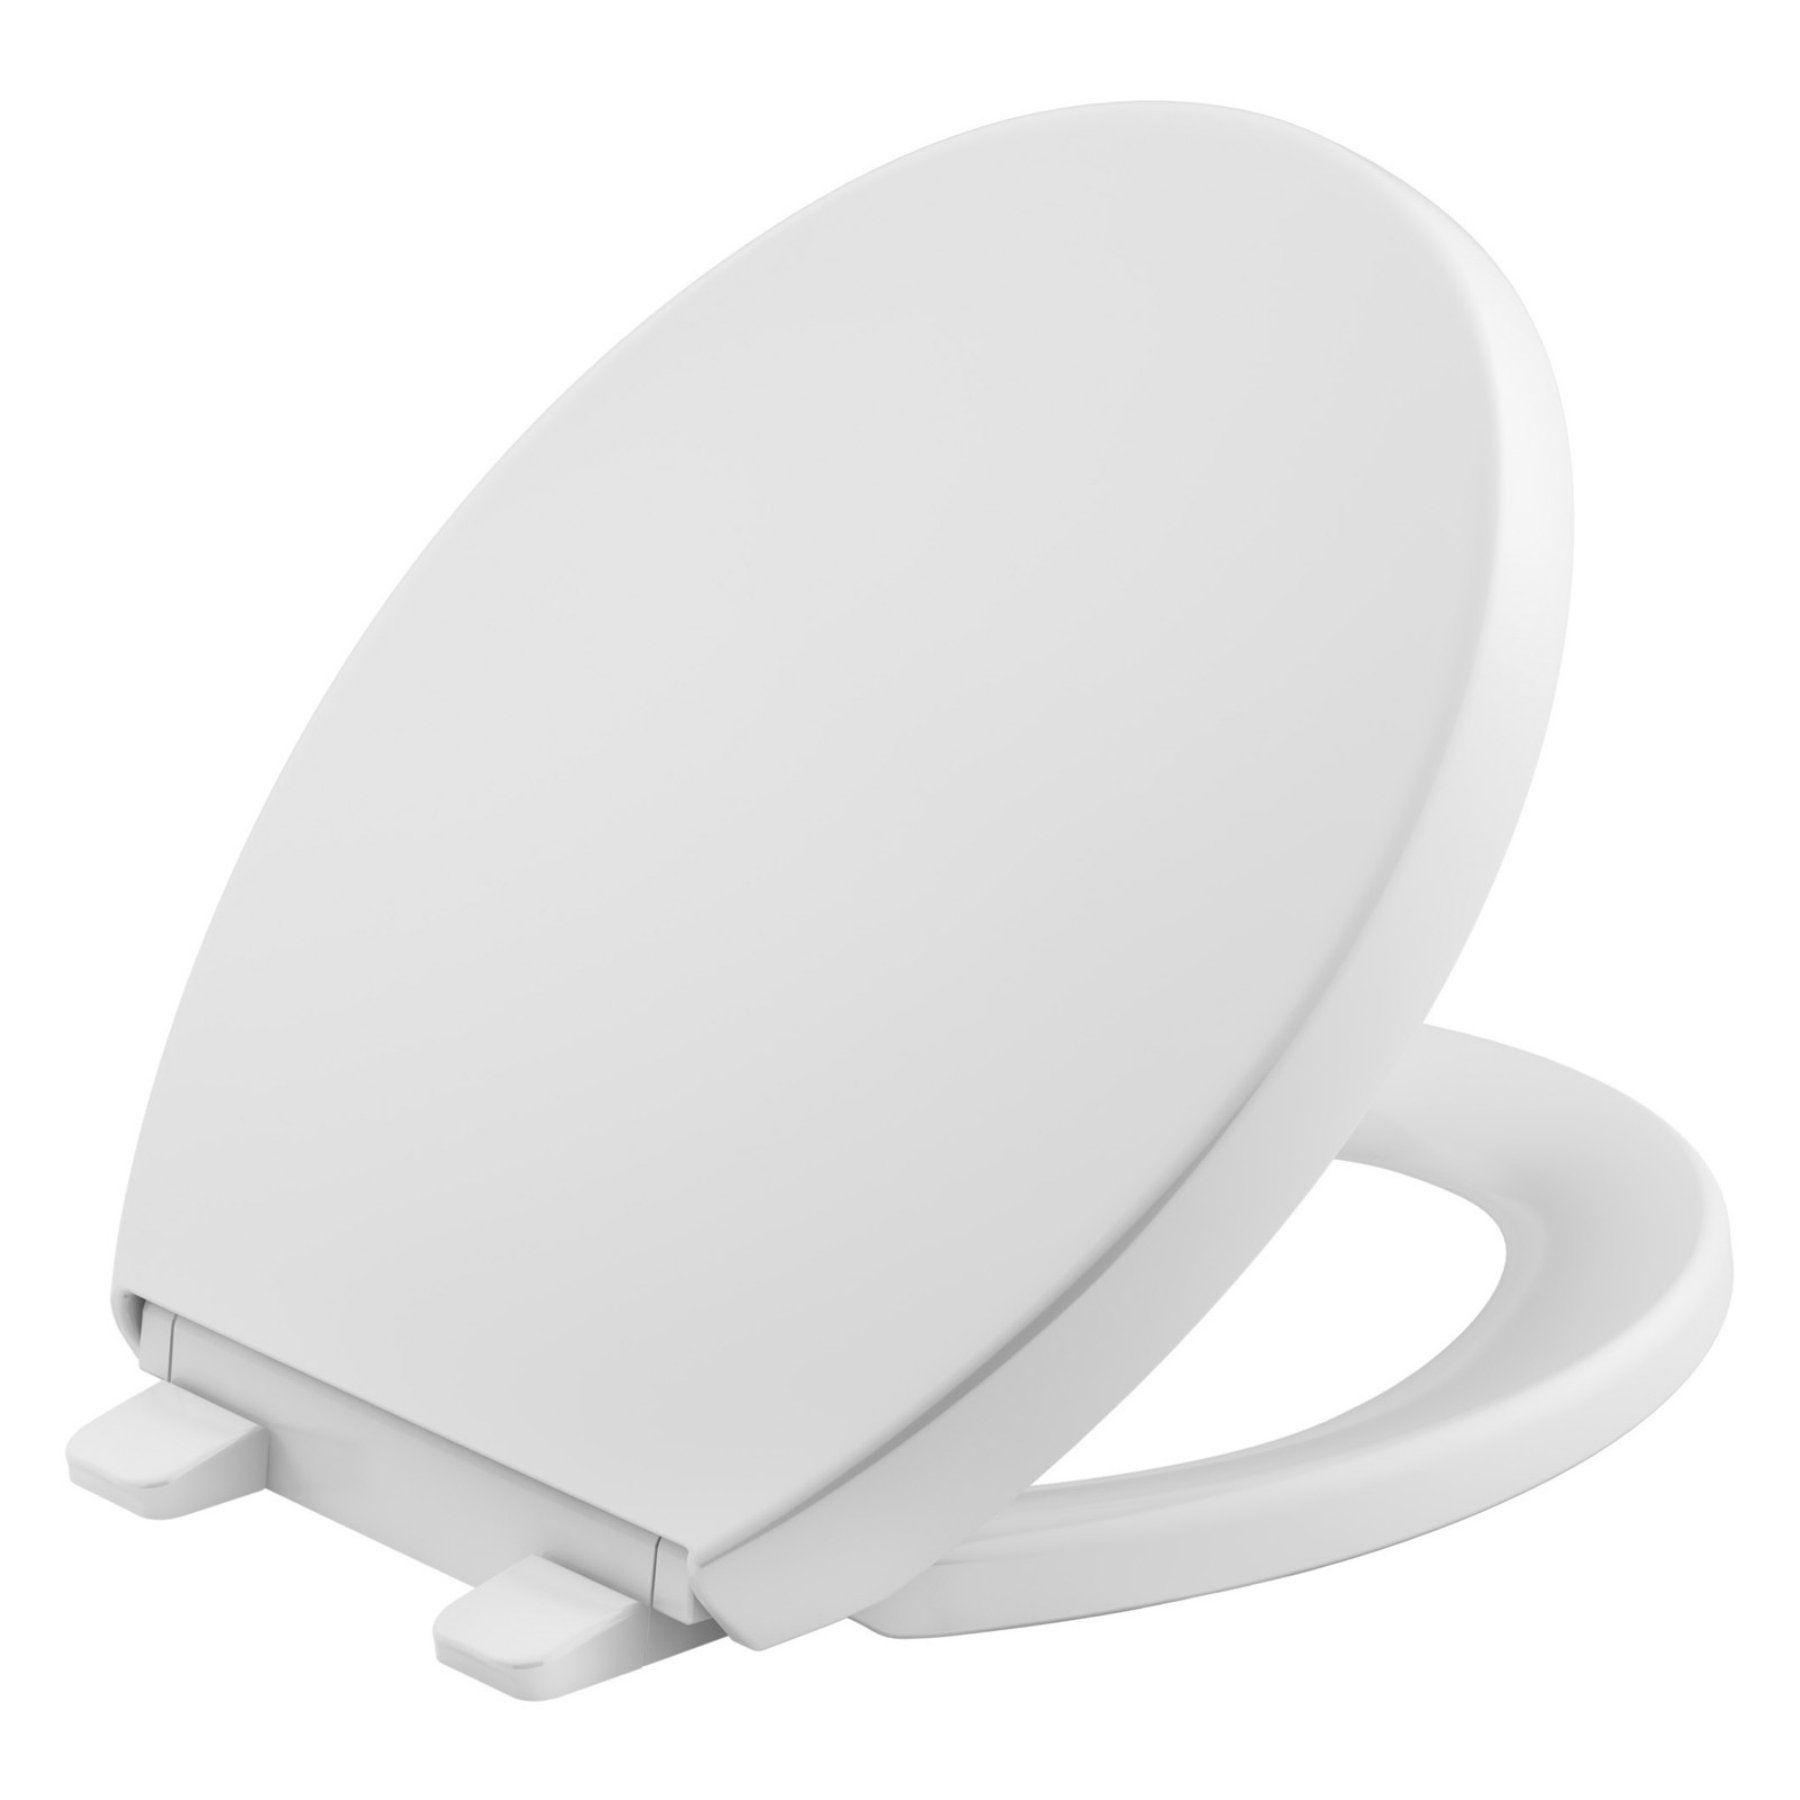 Kohler Reveal Quiet Close Round Toilet Seat With Grip Tight